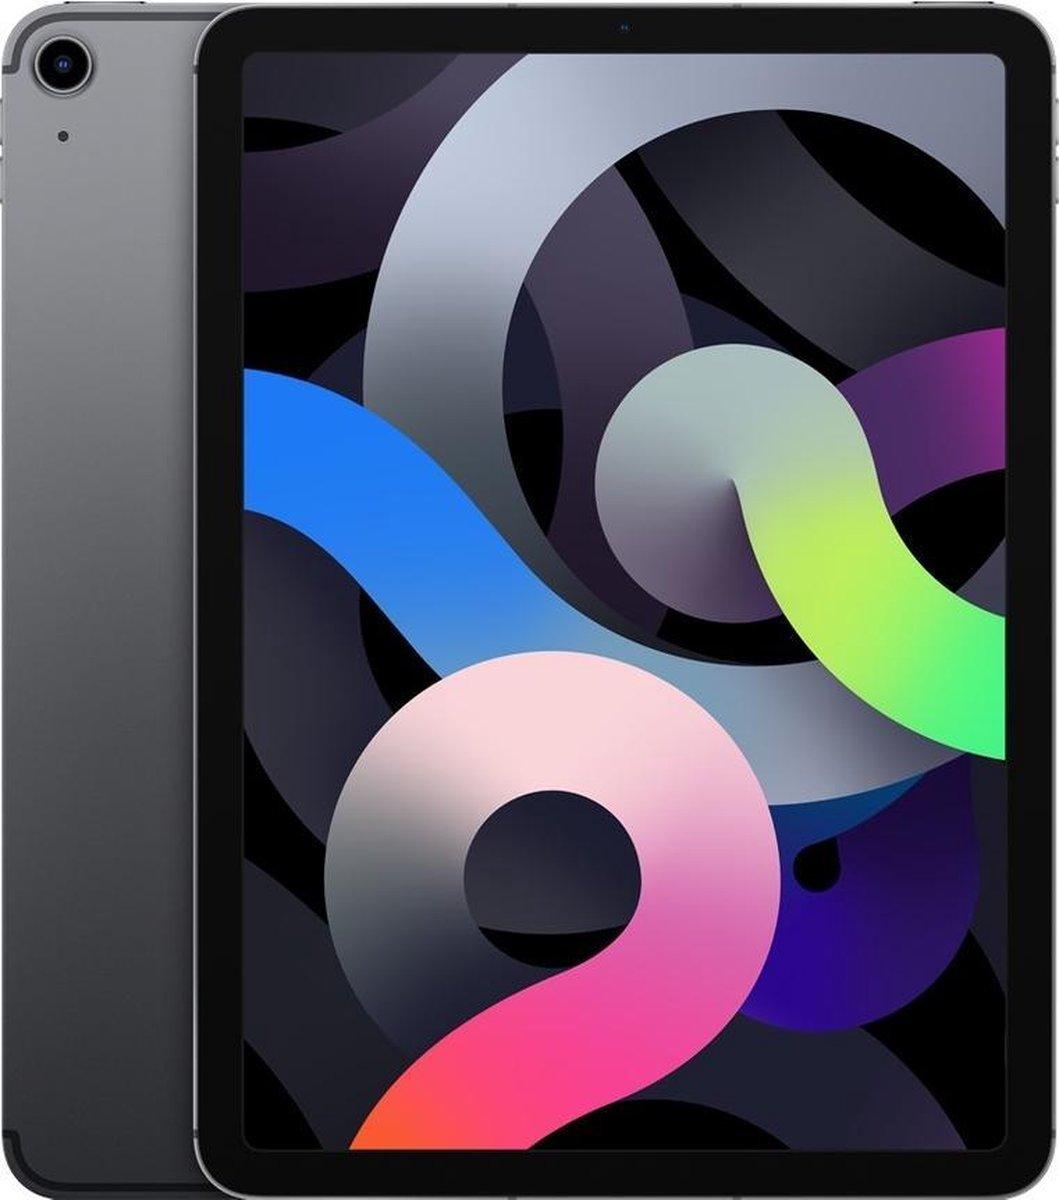 Apple iPad Air 11 Wi-Fi Cell 256GB Space Grey MYH22FD/A